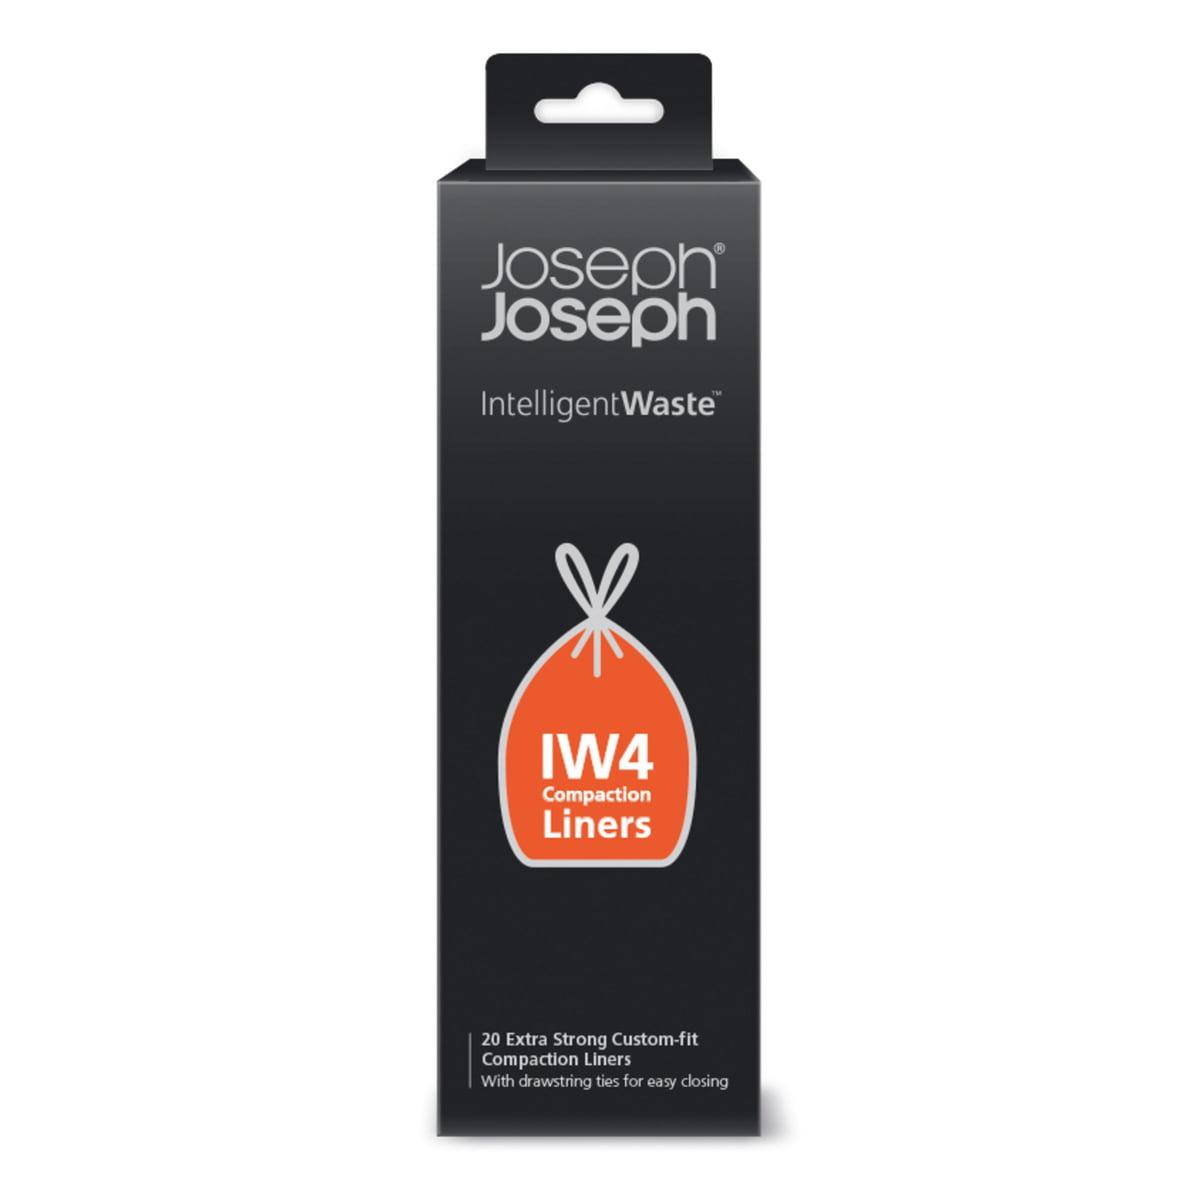 Joseph Joseph - Müllbeutel zu Titan Treteimer, 30 l (20er-Pack)   Bad > Bad-Accessoires > Kosmetikeimer   Schwarz   Hdpe (hart-polyethylen)   Joseph Joseph